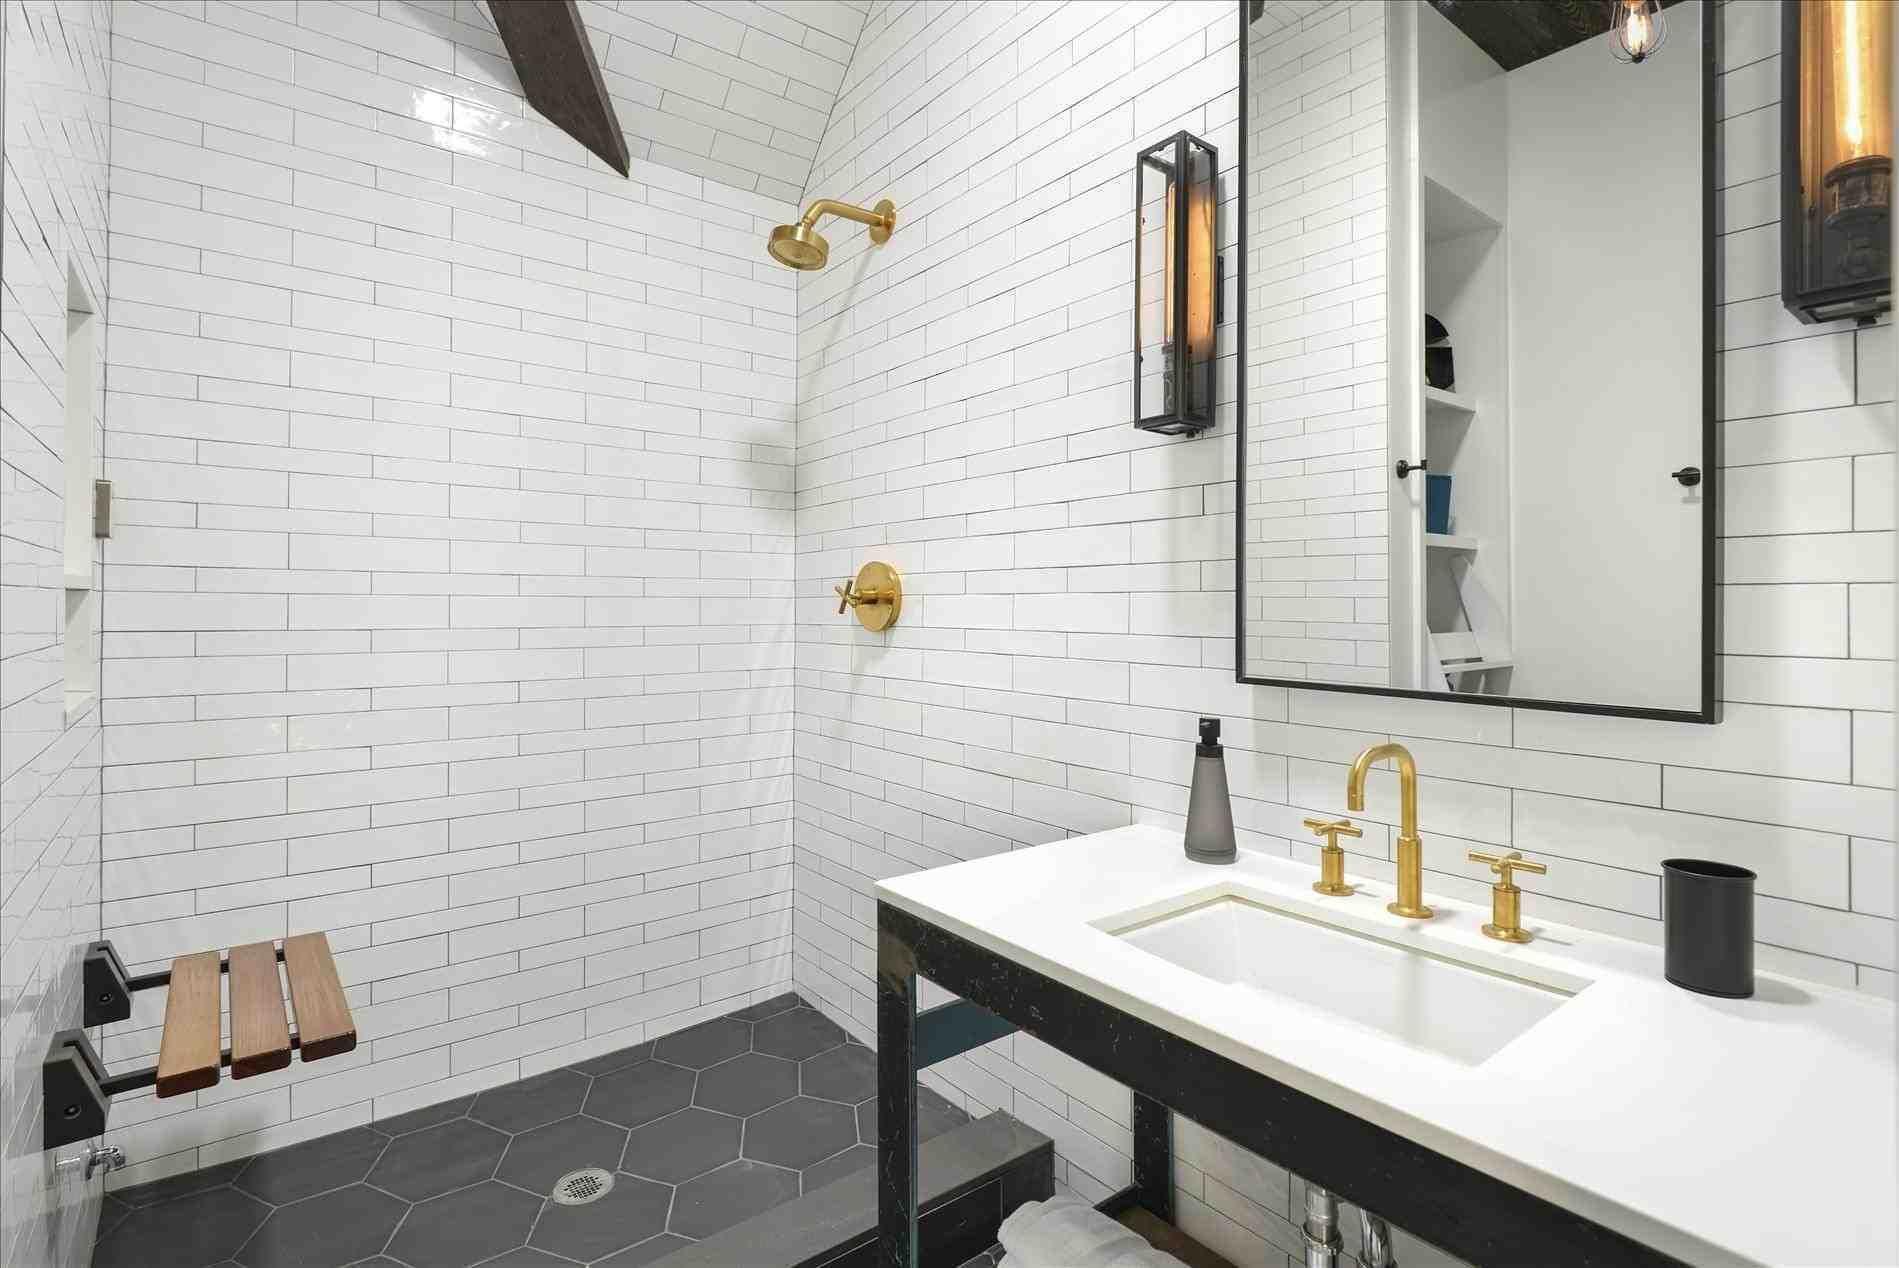 New Post bathroom tile options   LivingRooms   Pinterest